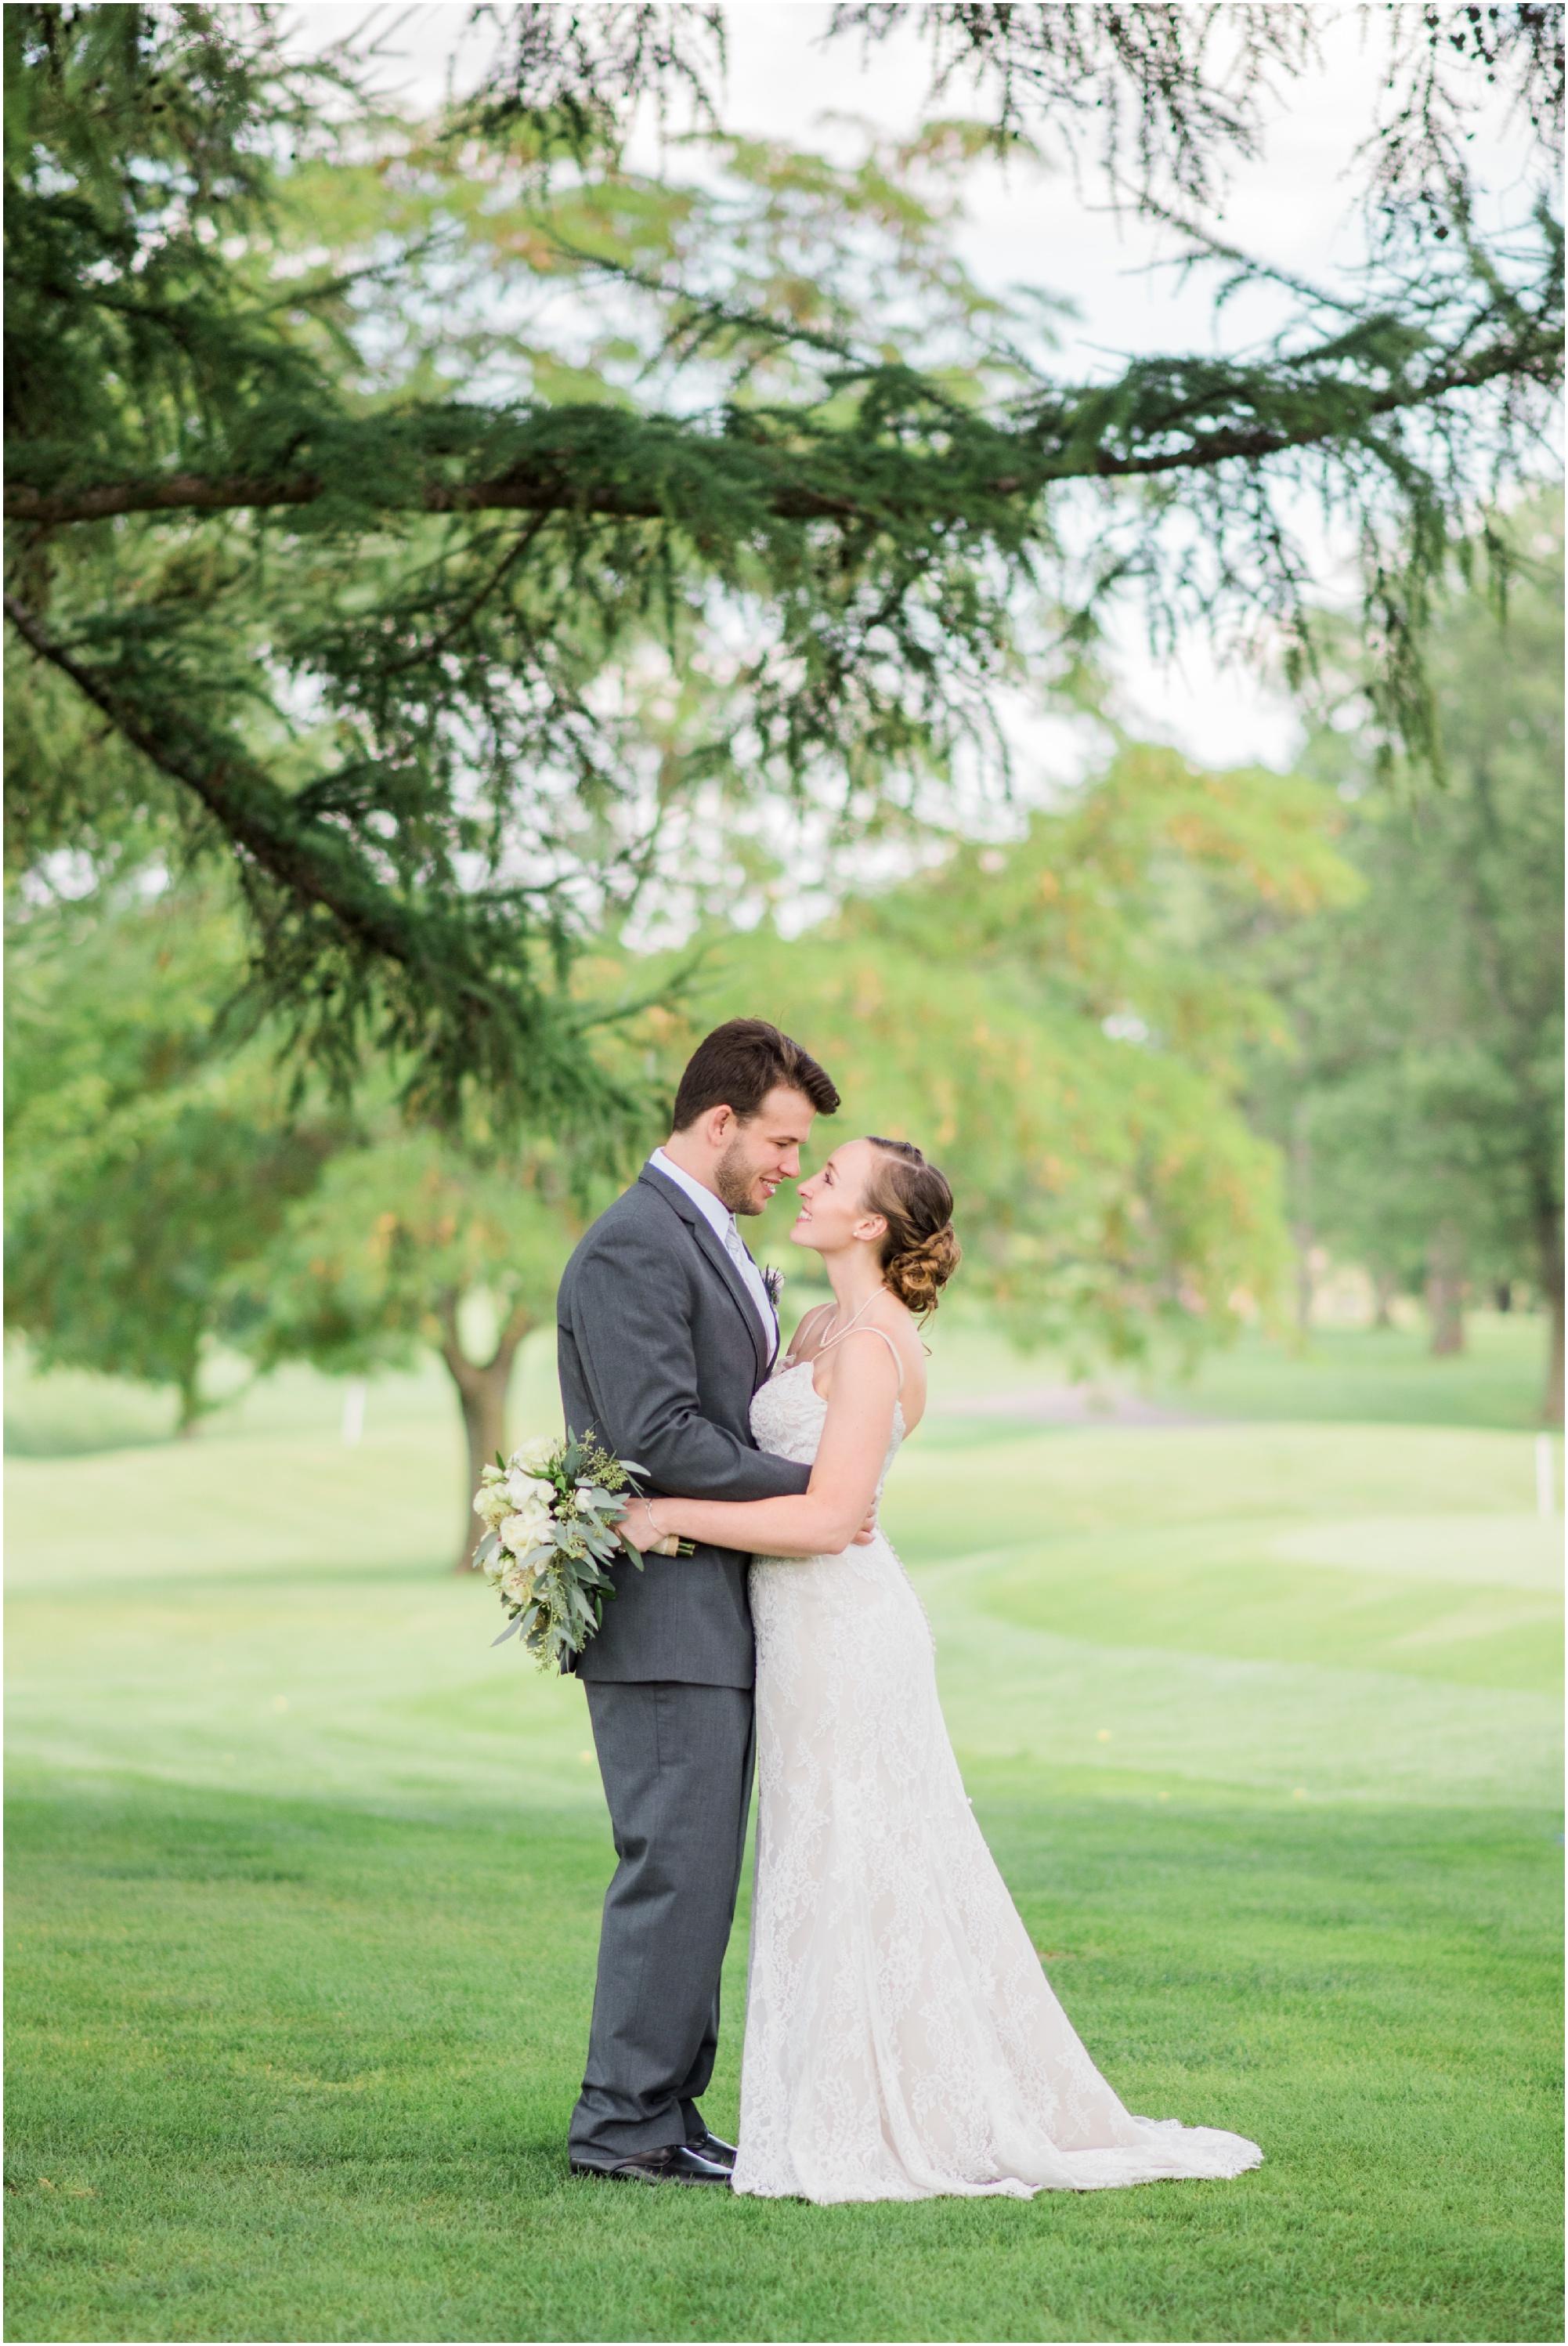 Wisconsin-Wedding-Photographer-Reedsburg-Country-Club-Kaela-and Matt-Wedding-242.jpg